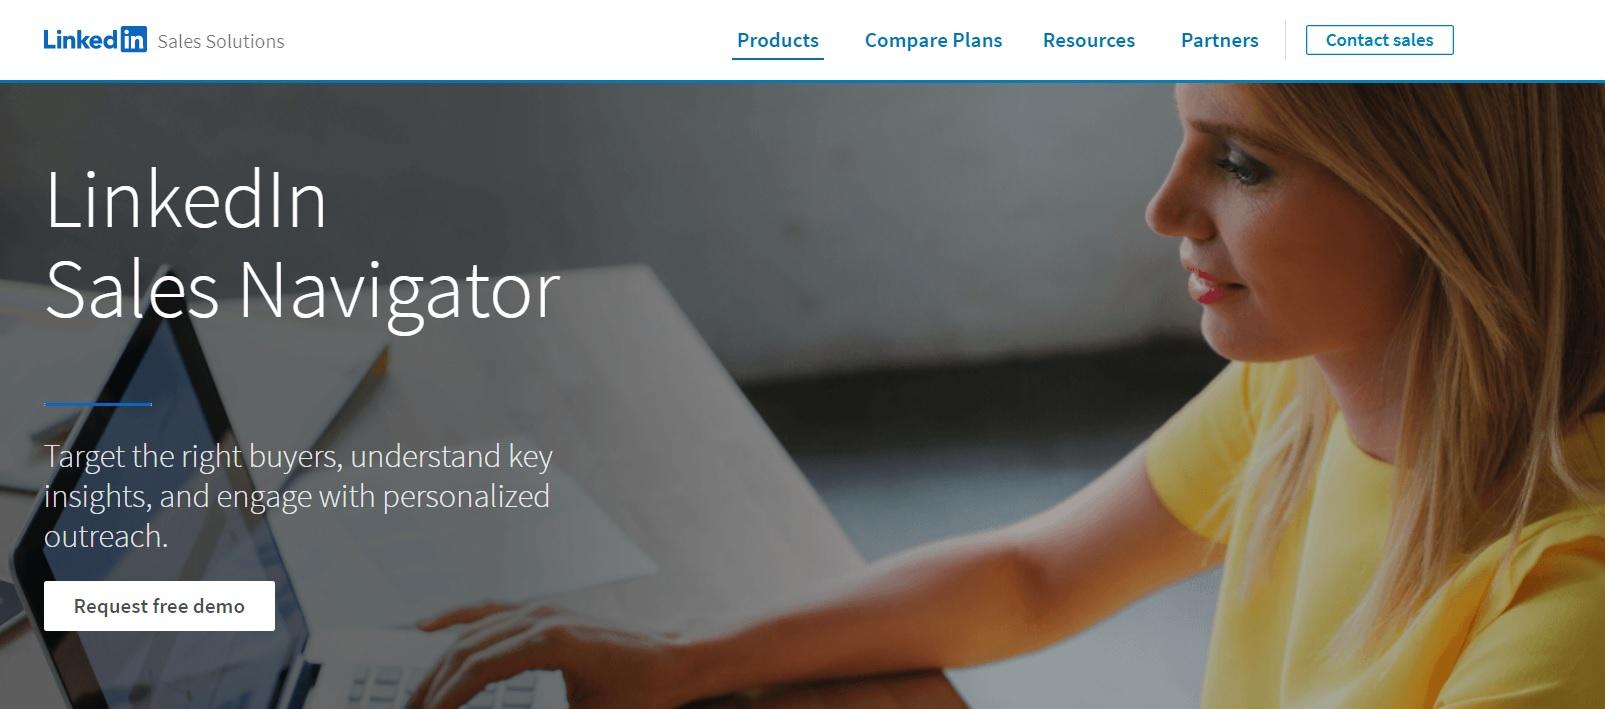 A screenshot of LinkedIn Sales Navigator's landing page.